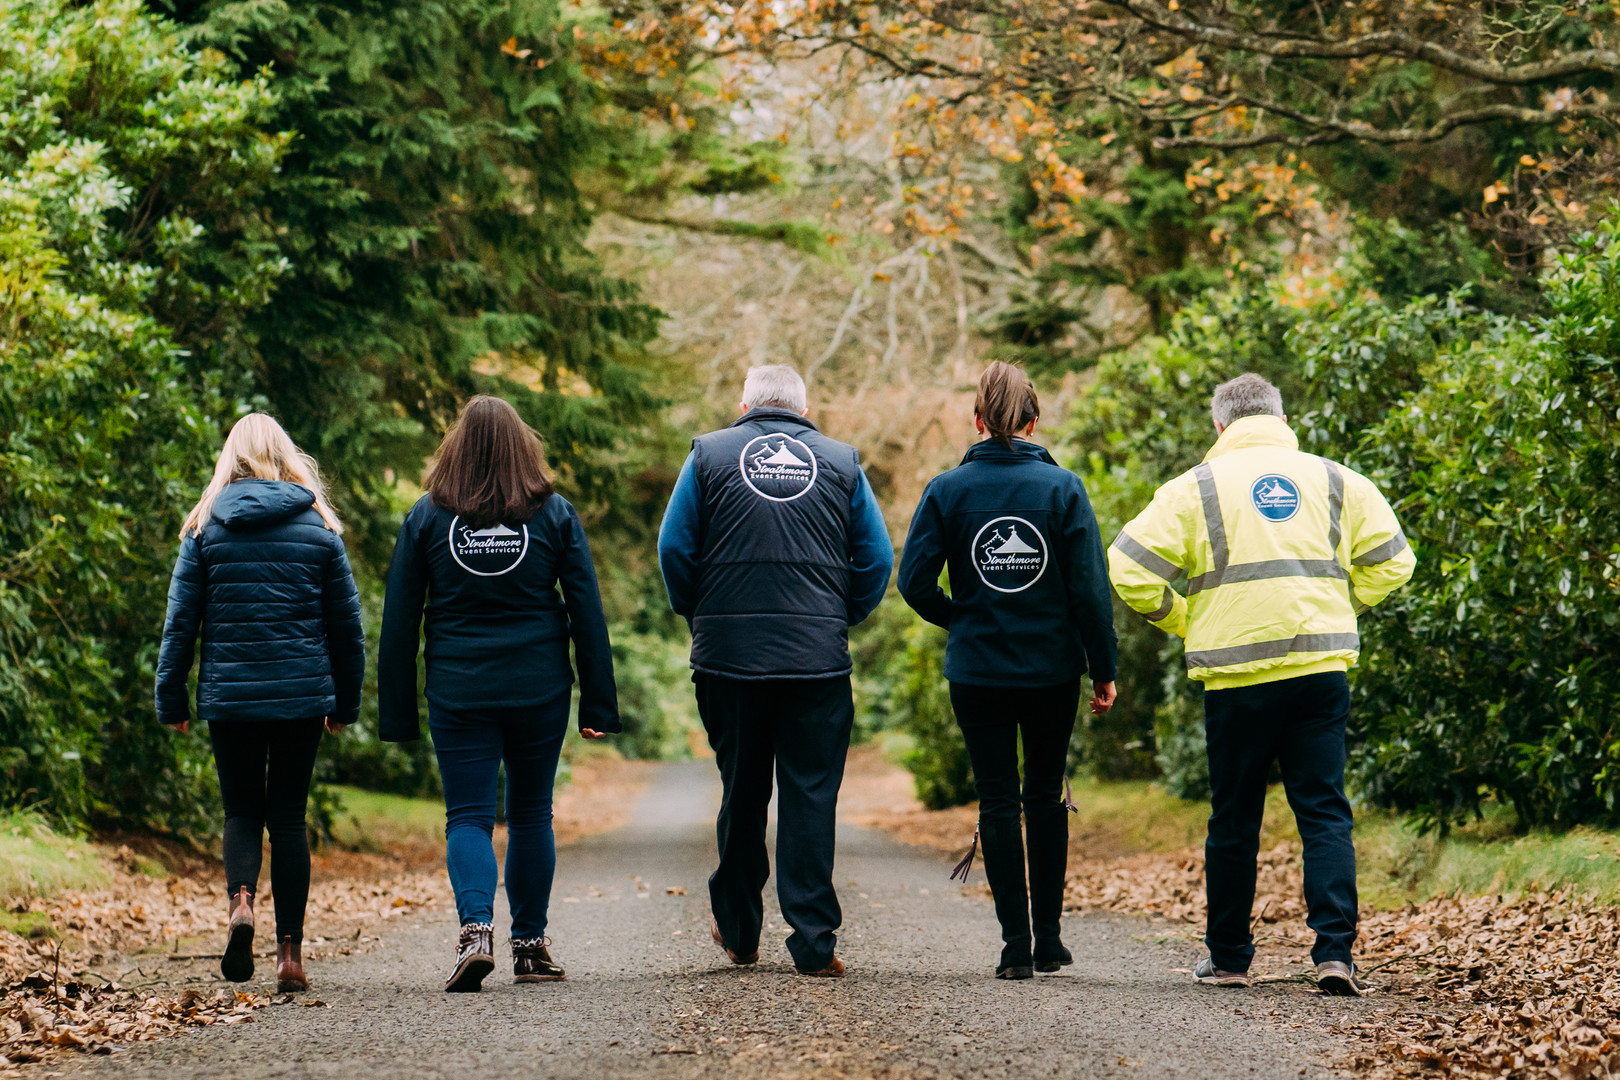 Strathmore Event Services Team